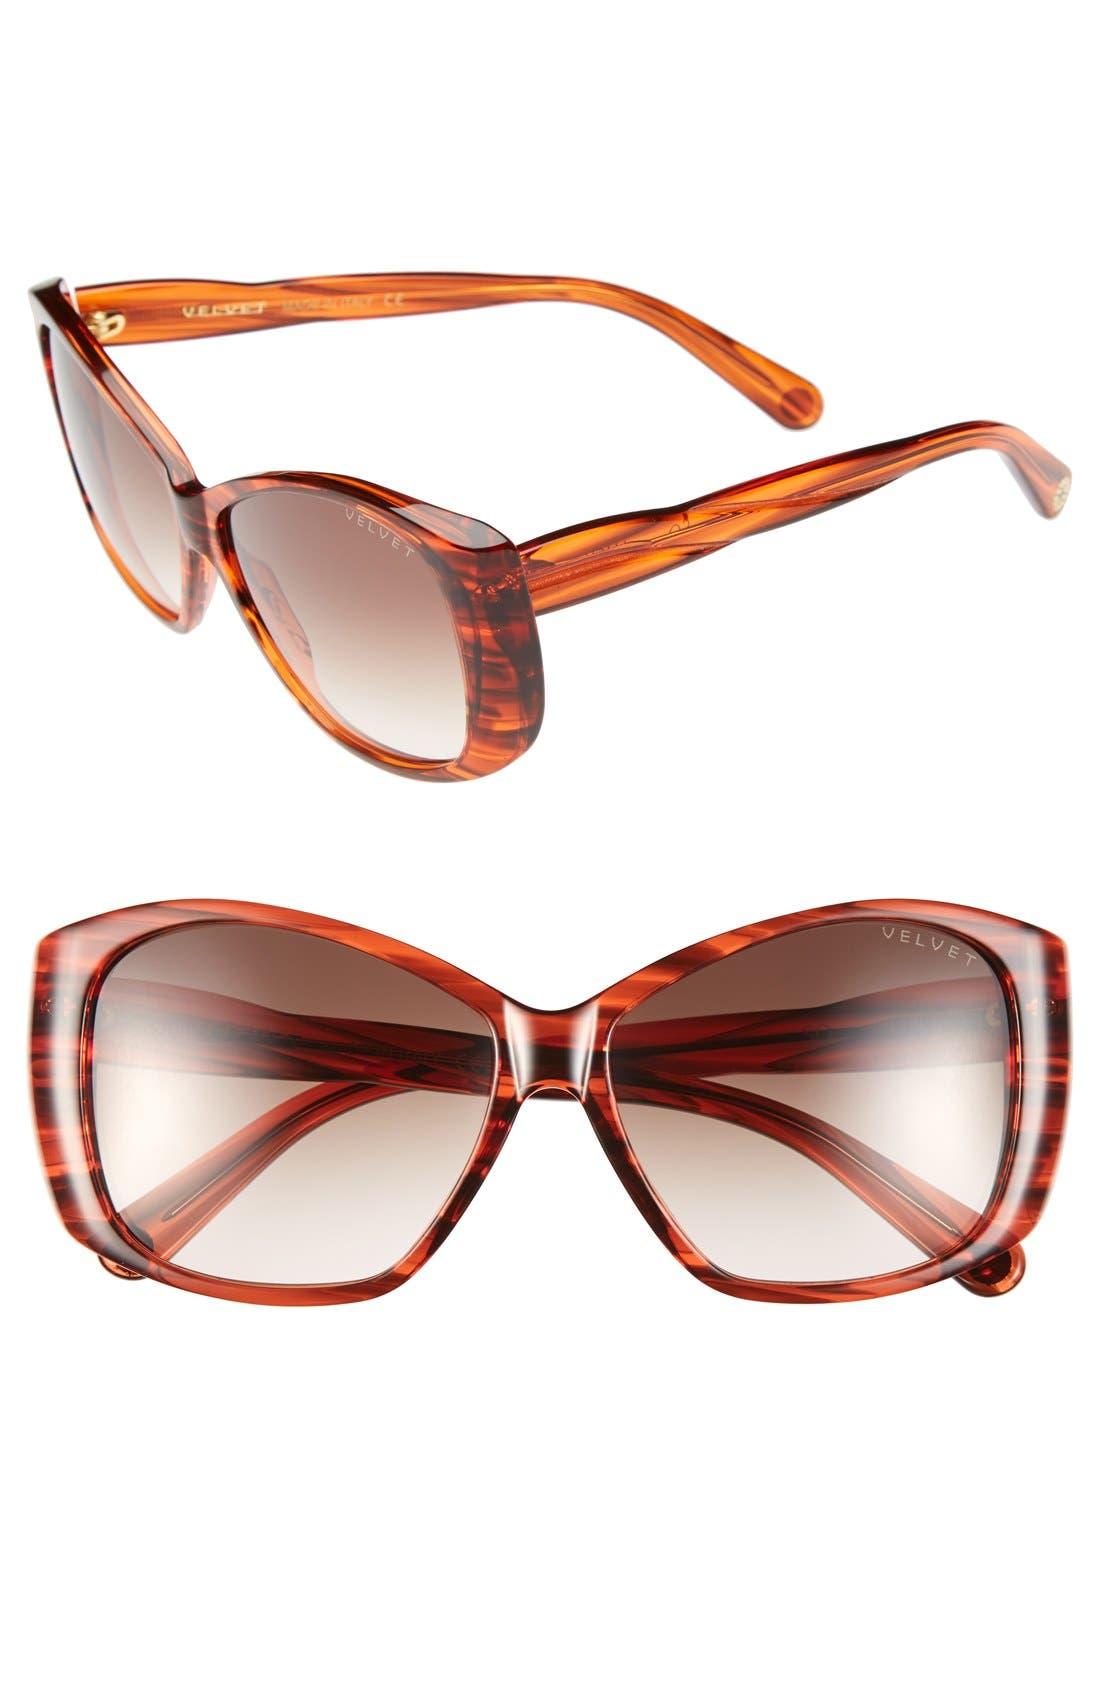 Main Image - Velvet Eyewear 'Lucy' 56mm Sunglasses